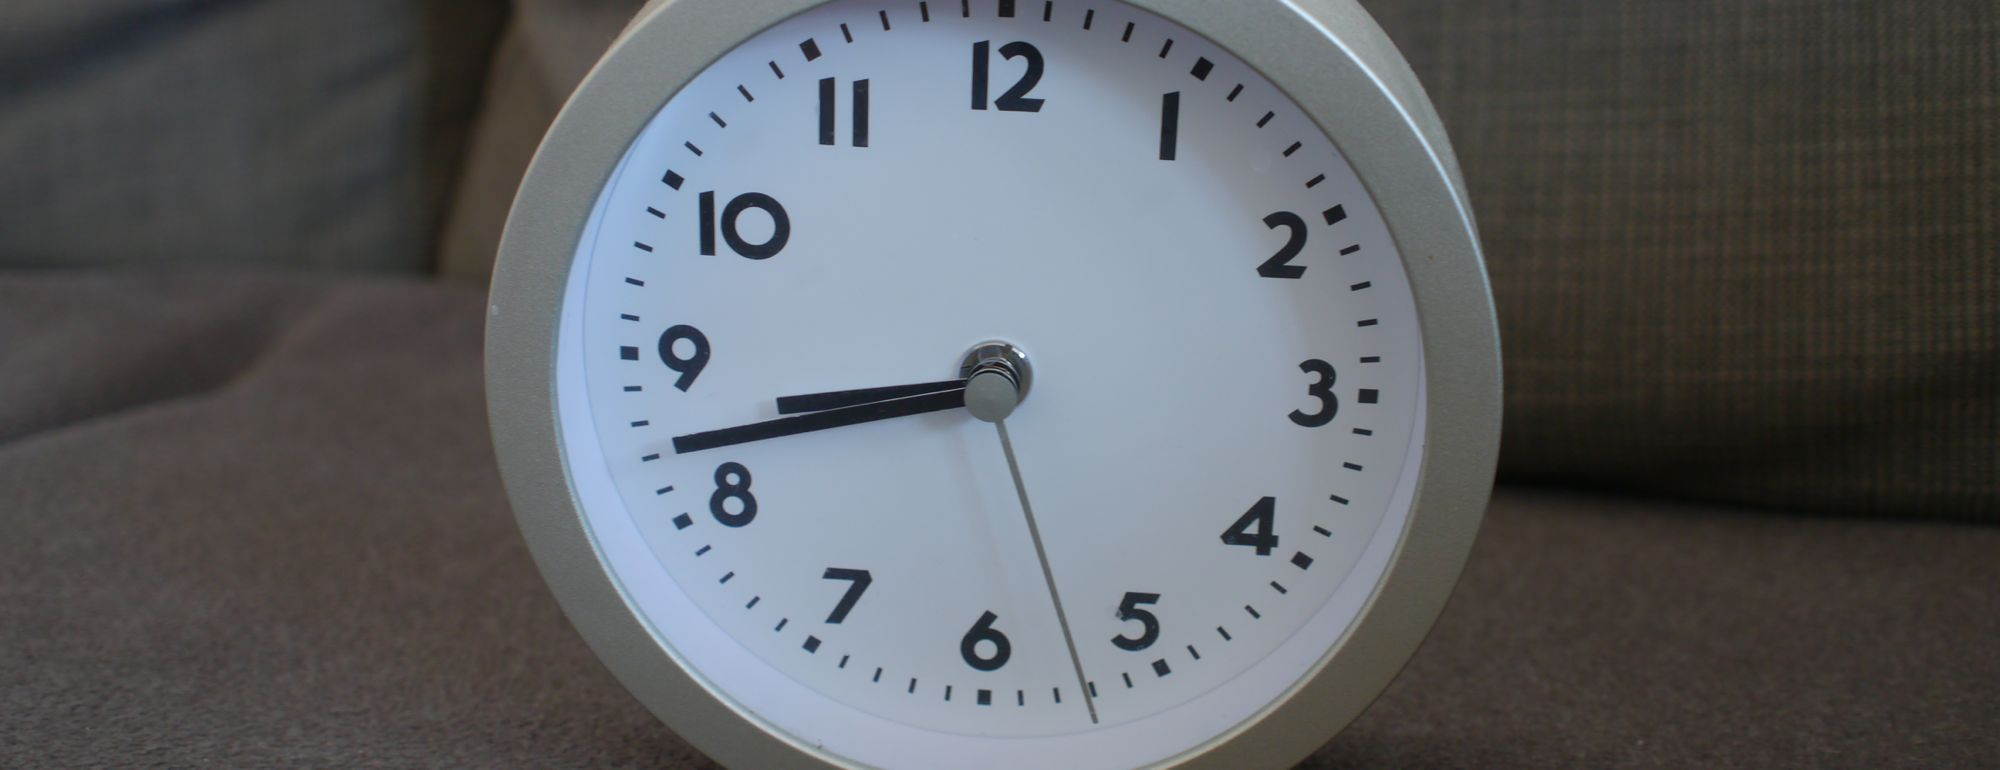 Uhr 2 quer